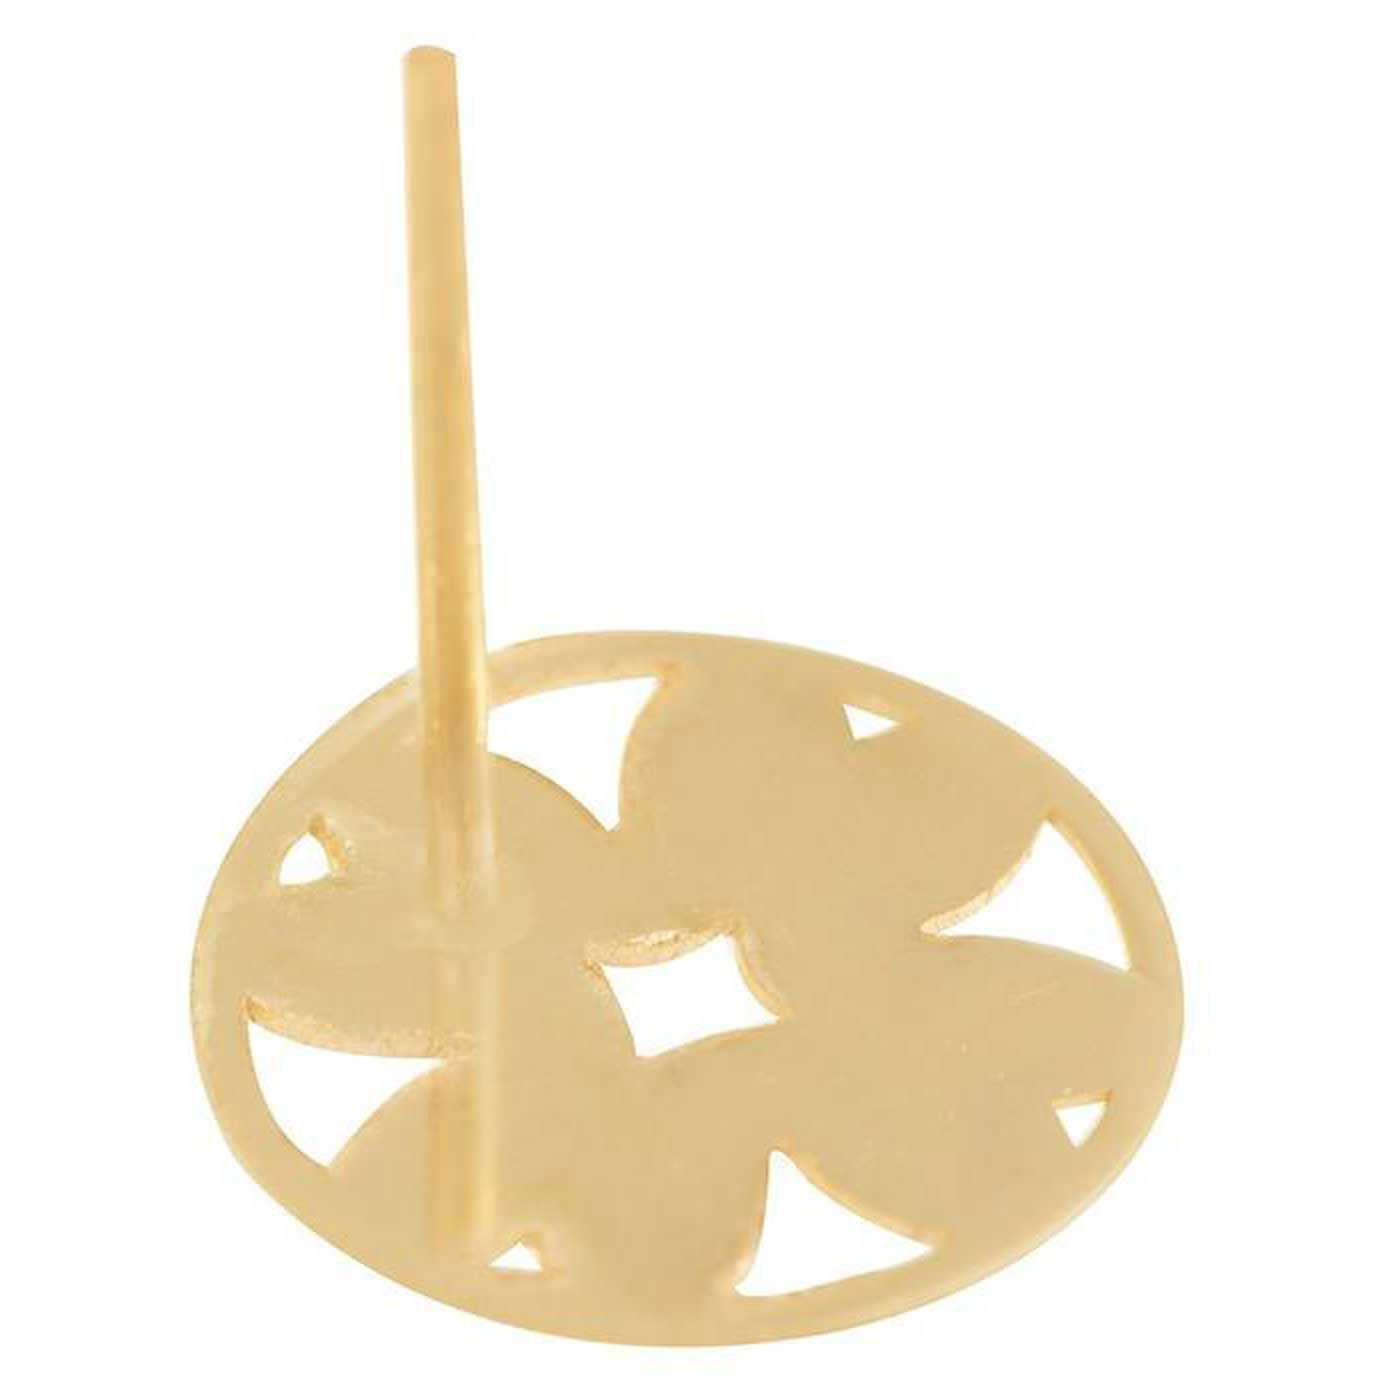 گوشواره طلا 18 عیار زنانه کانیار گالری کد GOA114 -  - 5